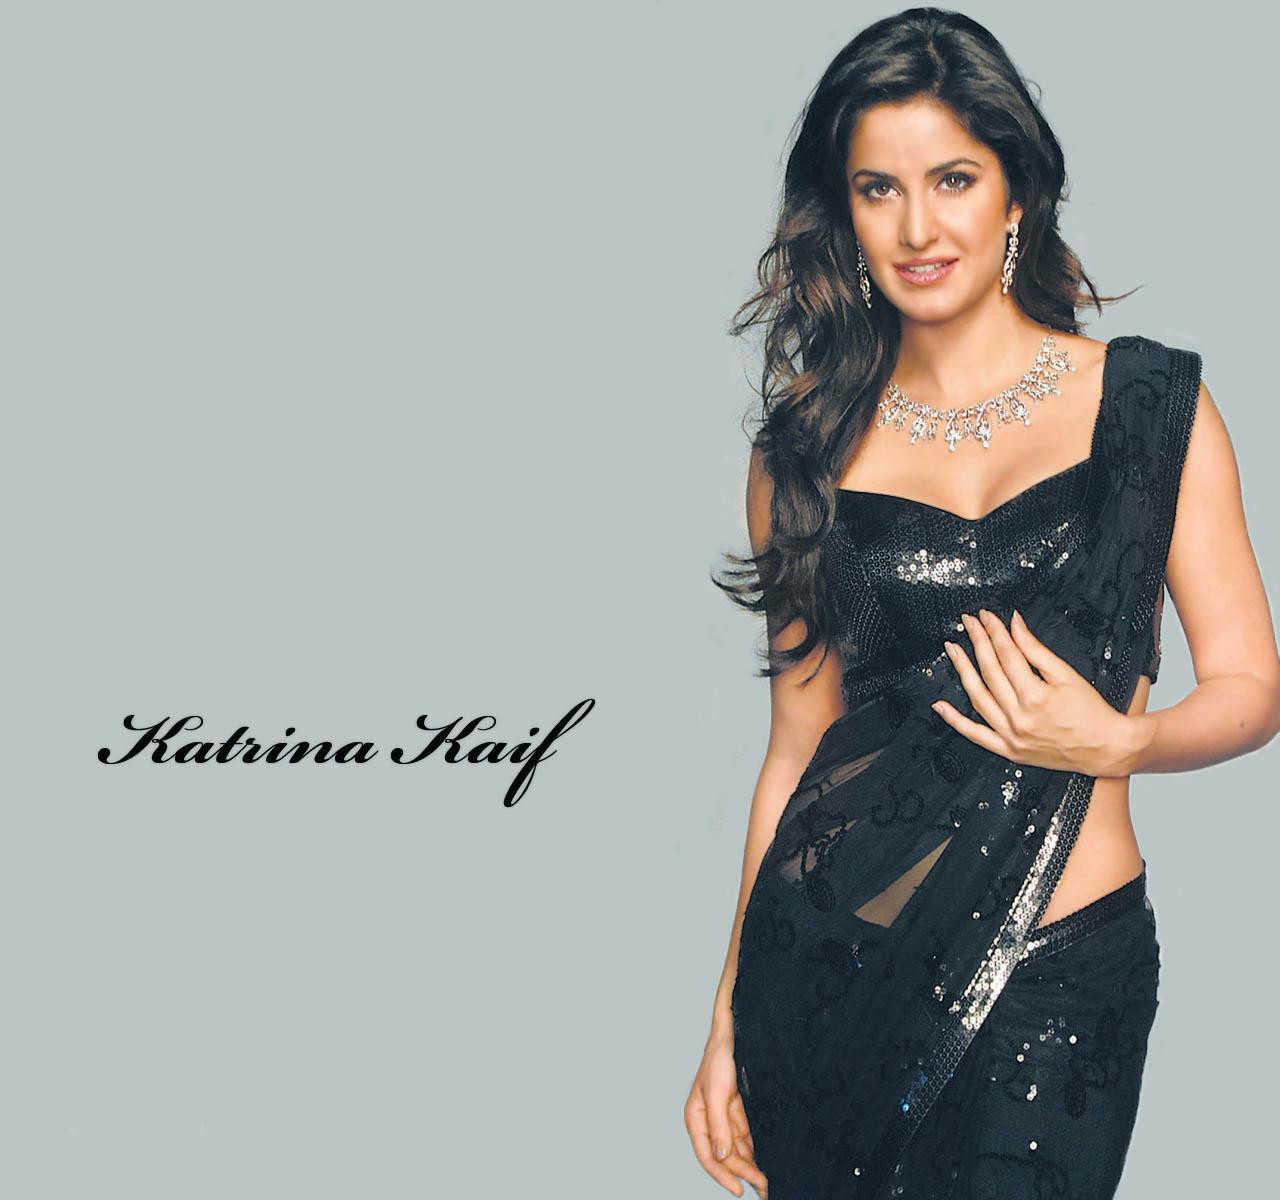 fashion & style: katrina kaif new and latest hd-hq wallpapers